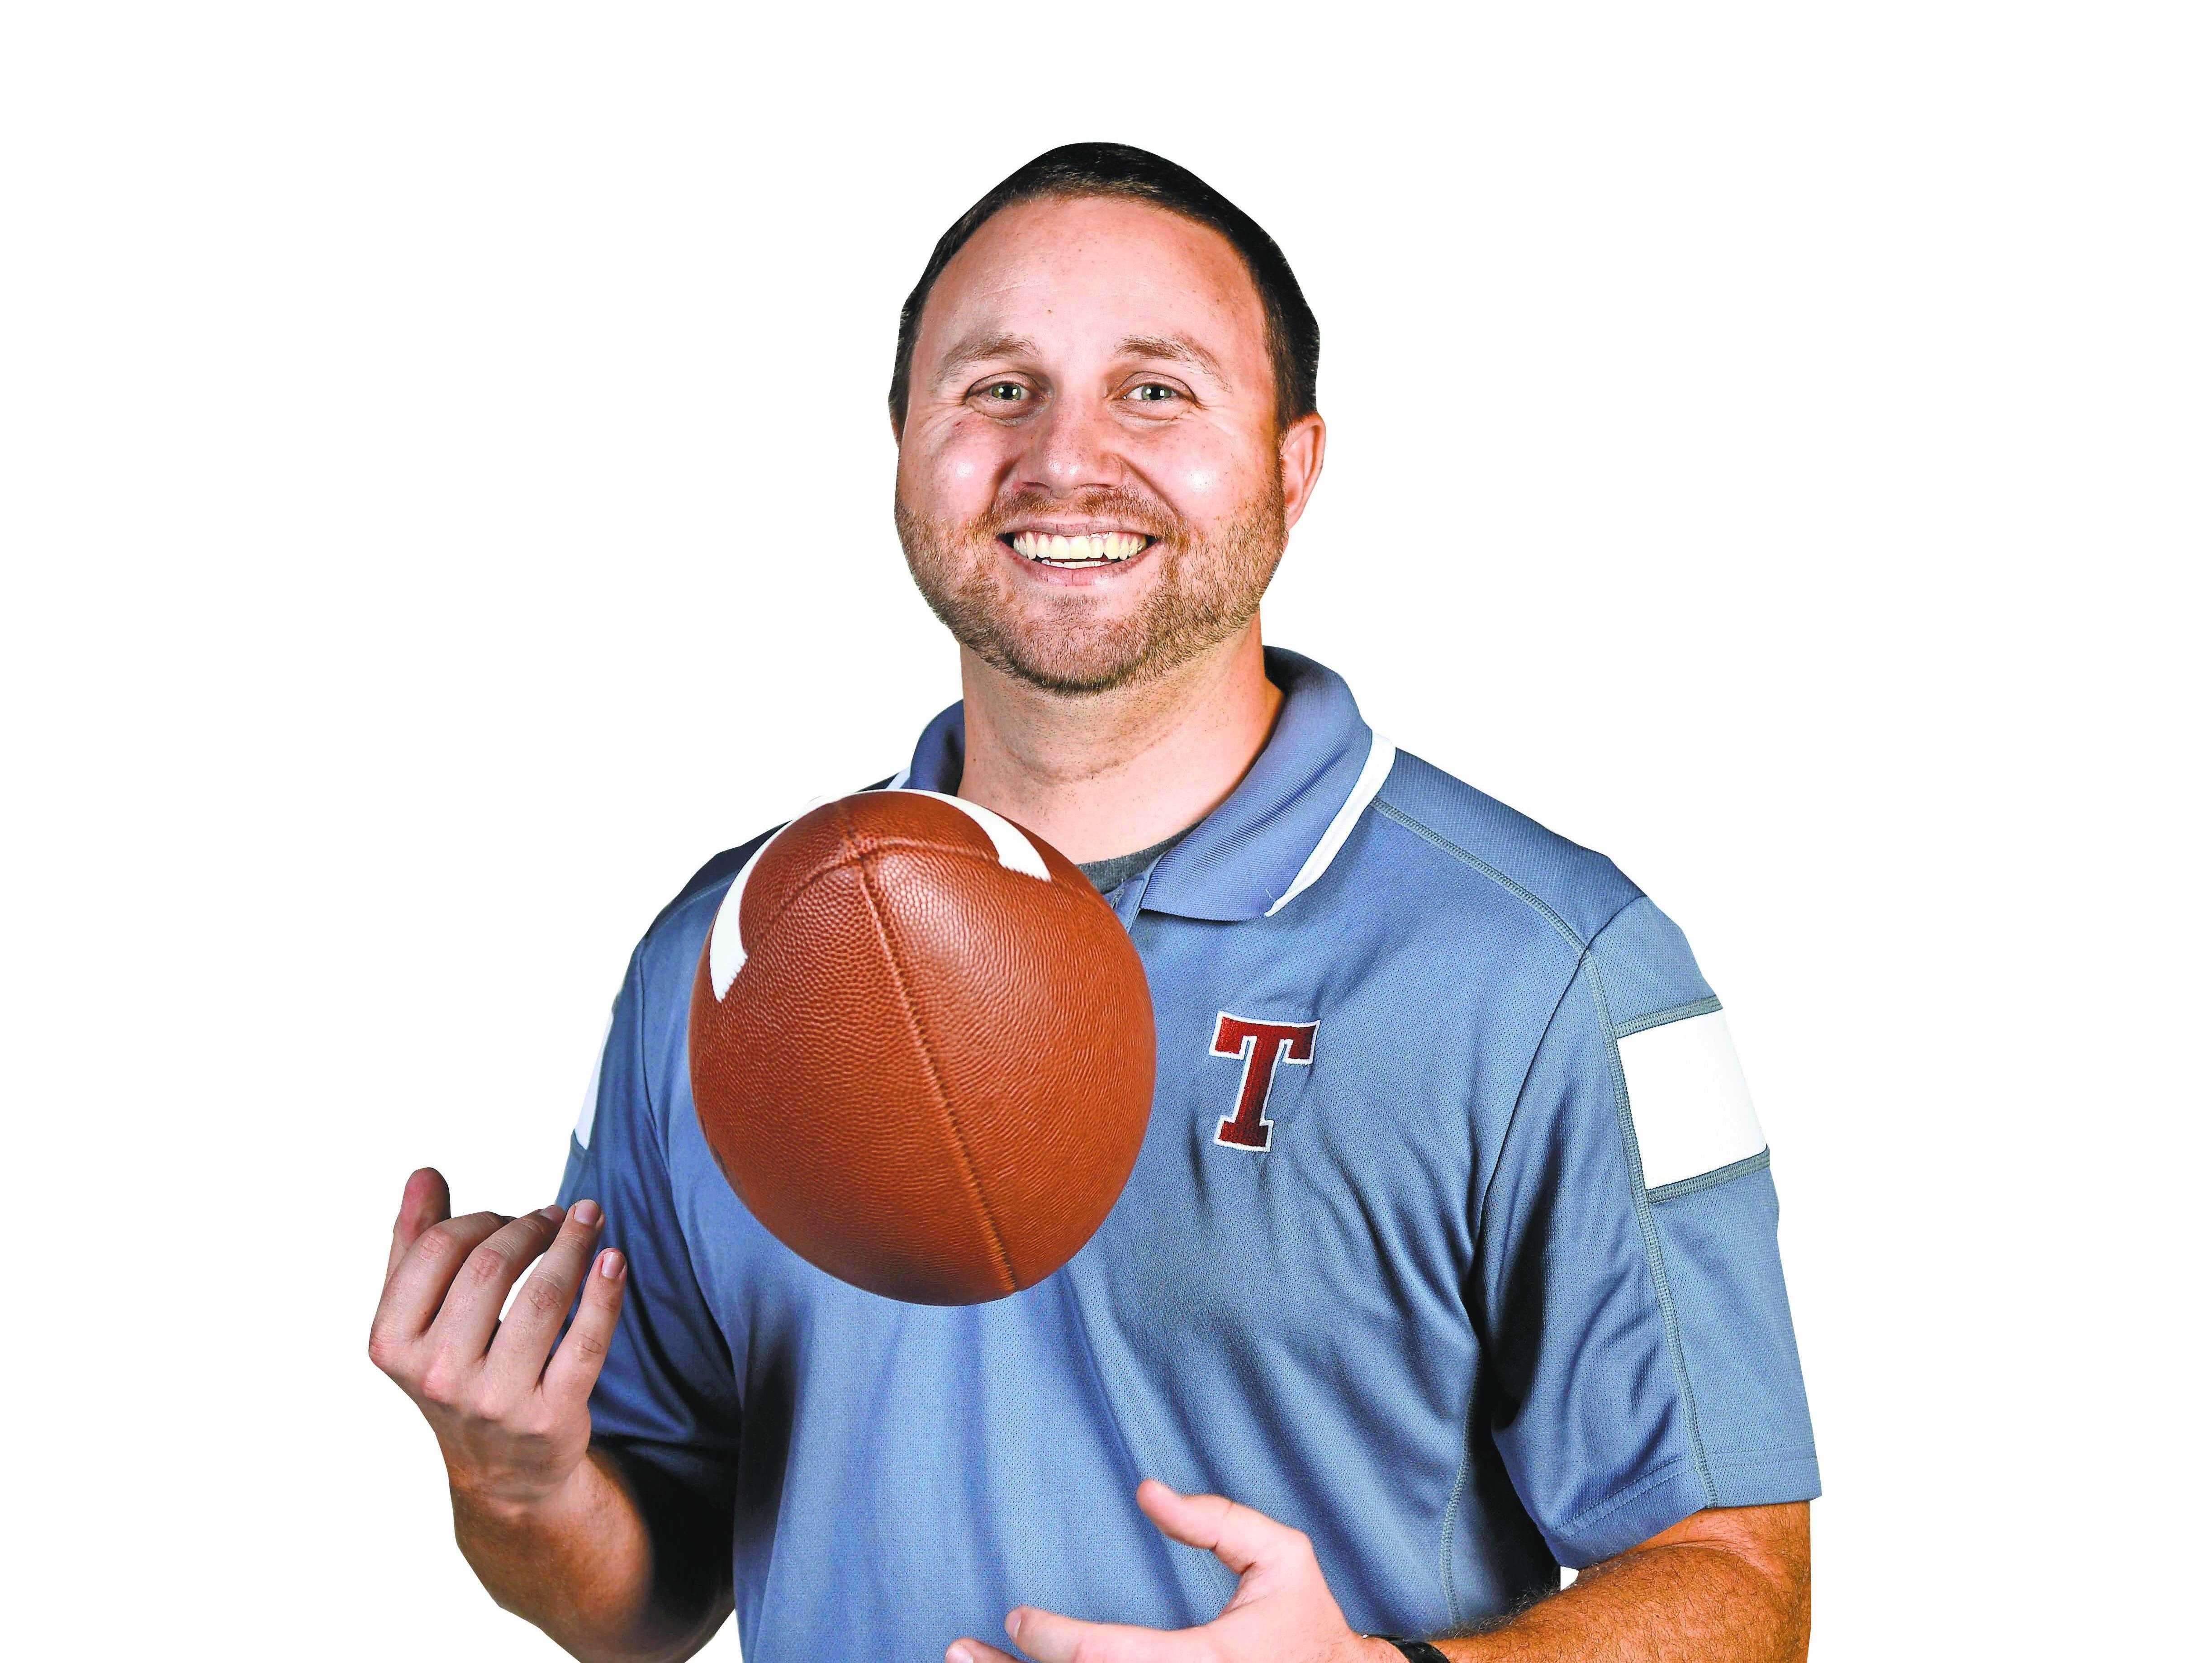 Jay Lindsey, Tate High School coach